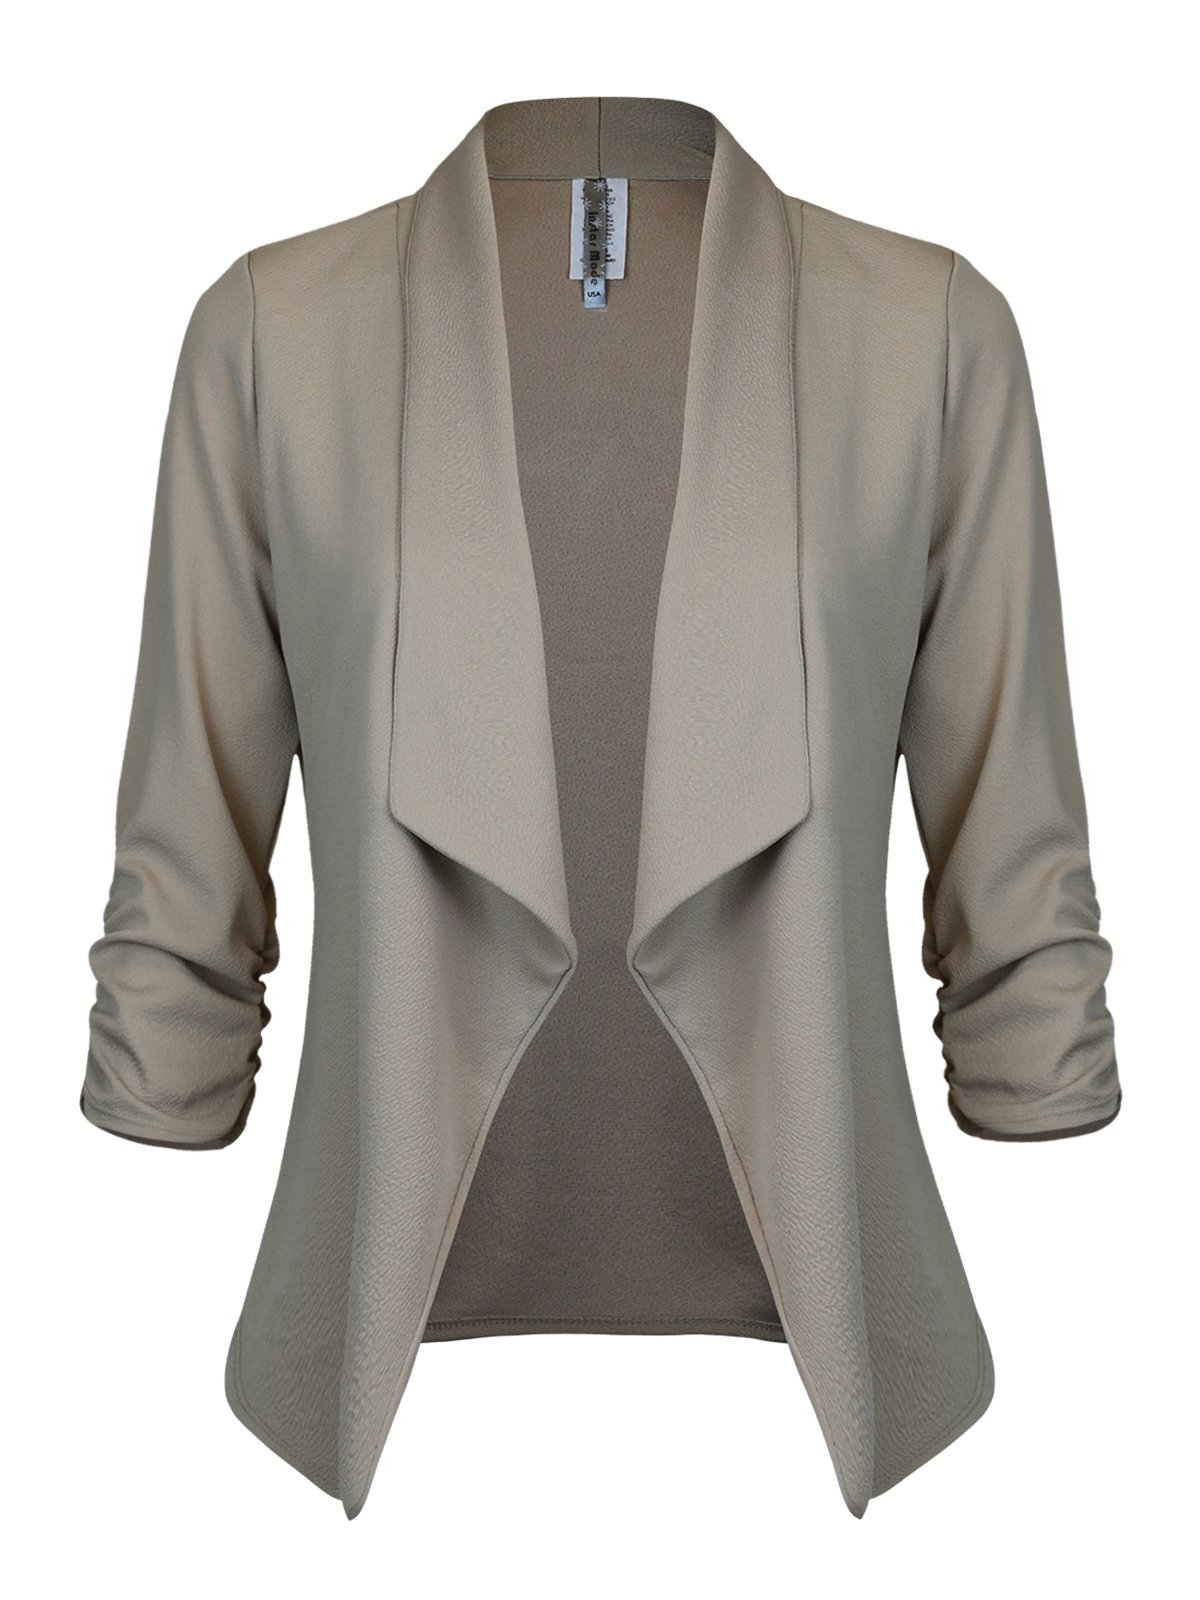 Instar Mode Women's Versatile Business Attire Blazers in Varies Styles (B12316 Khaki, Small)